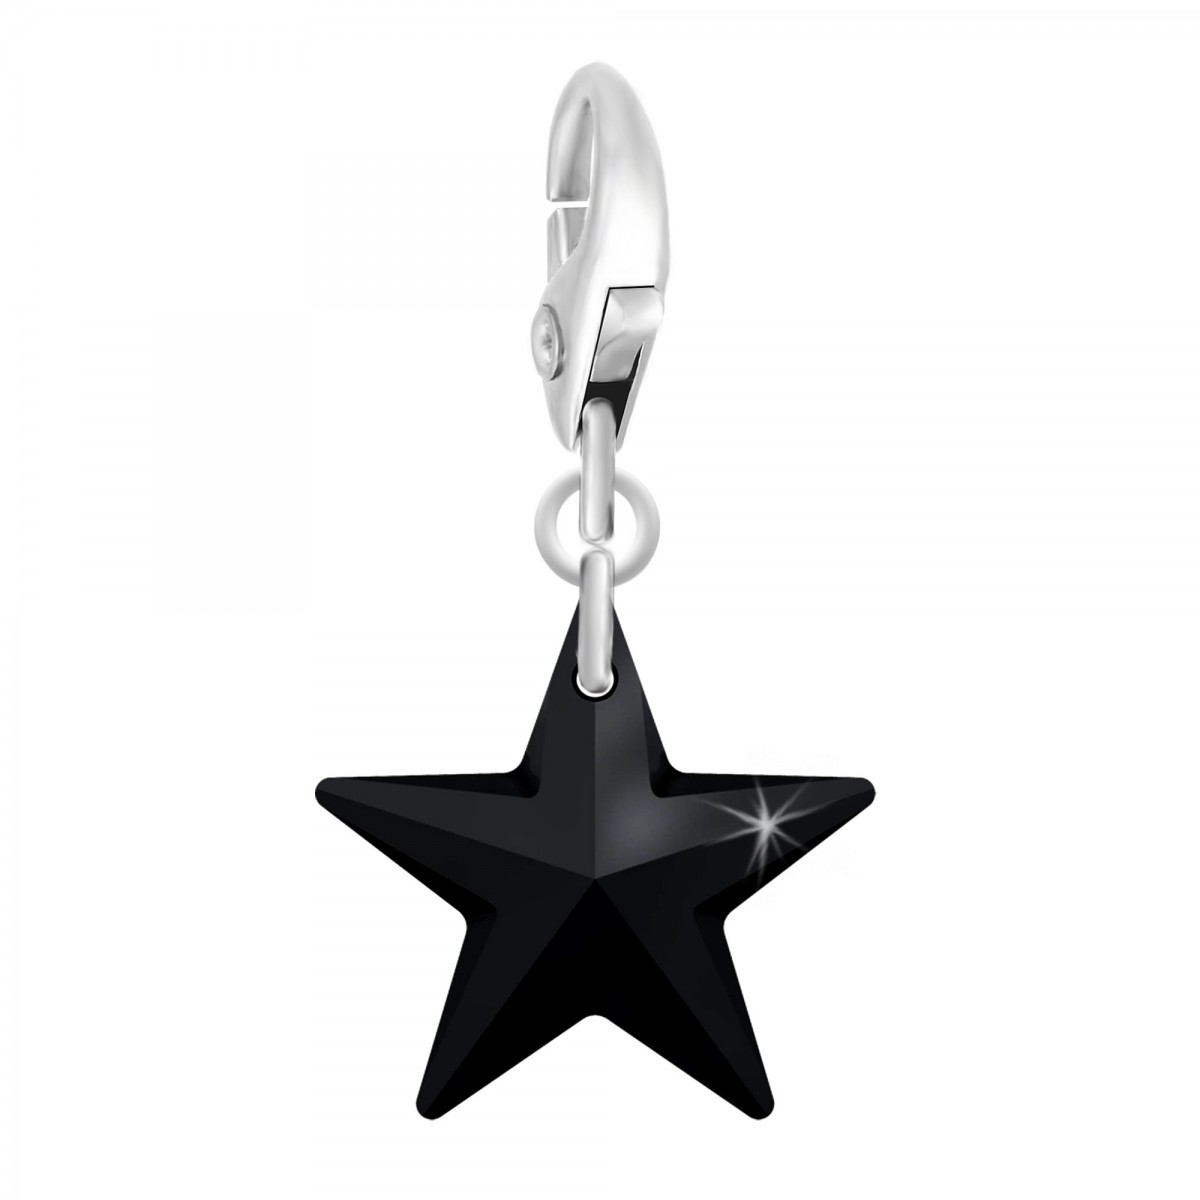 Charm étoile noire made with Crystal from Swarovski par So Charm